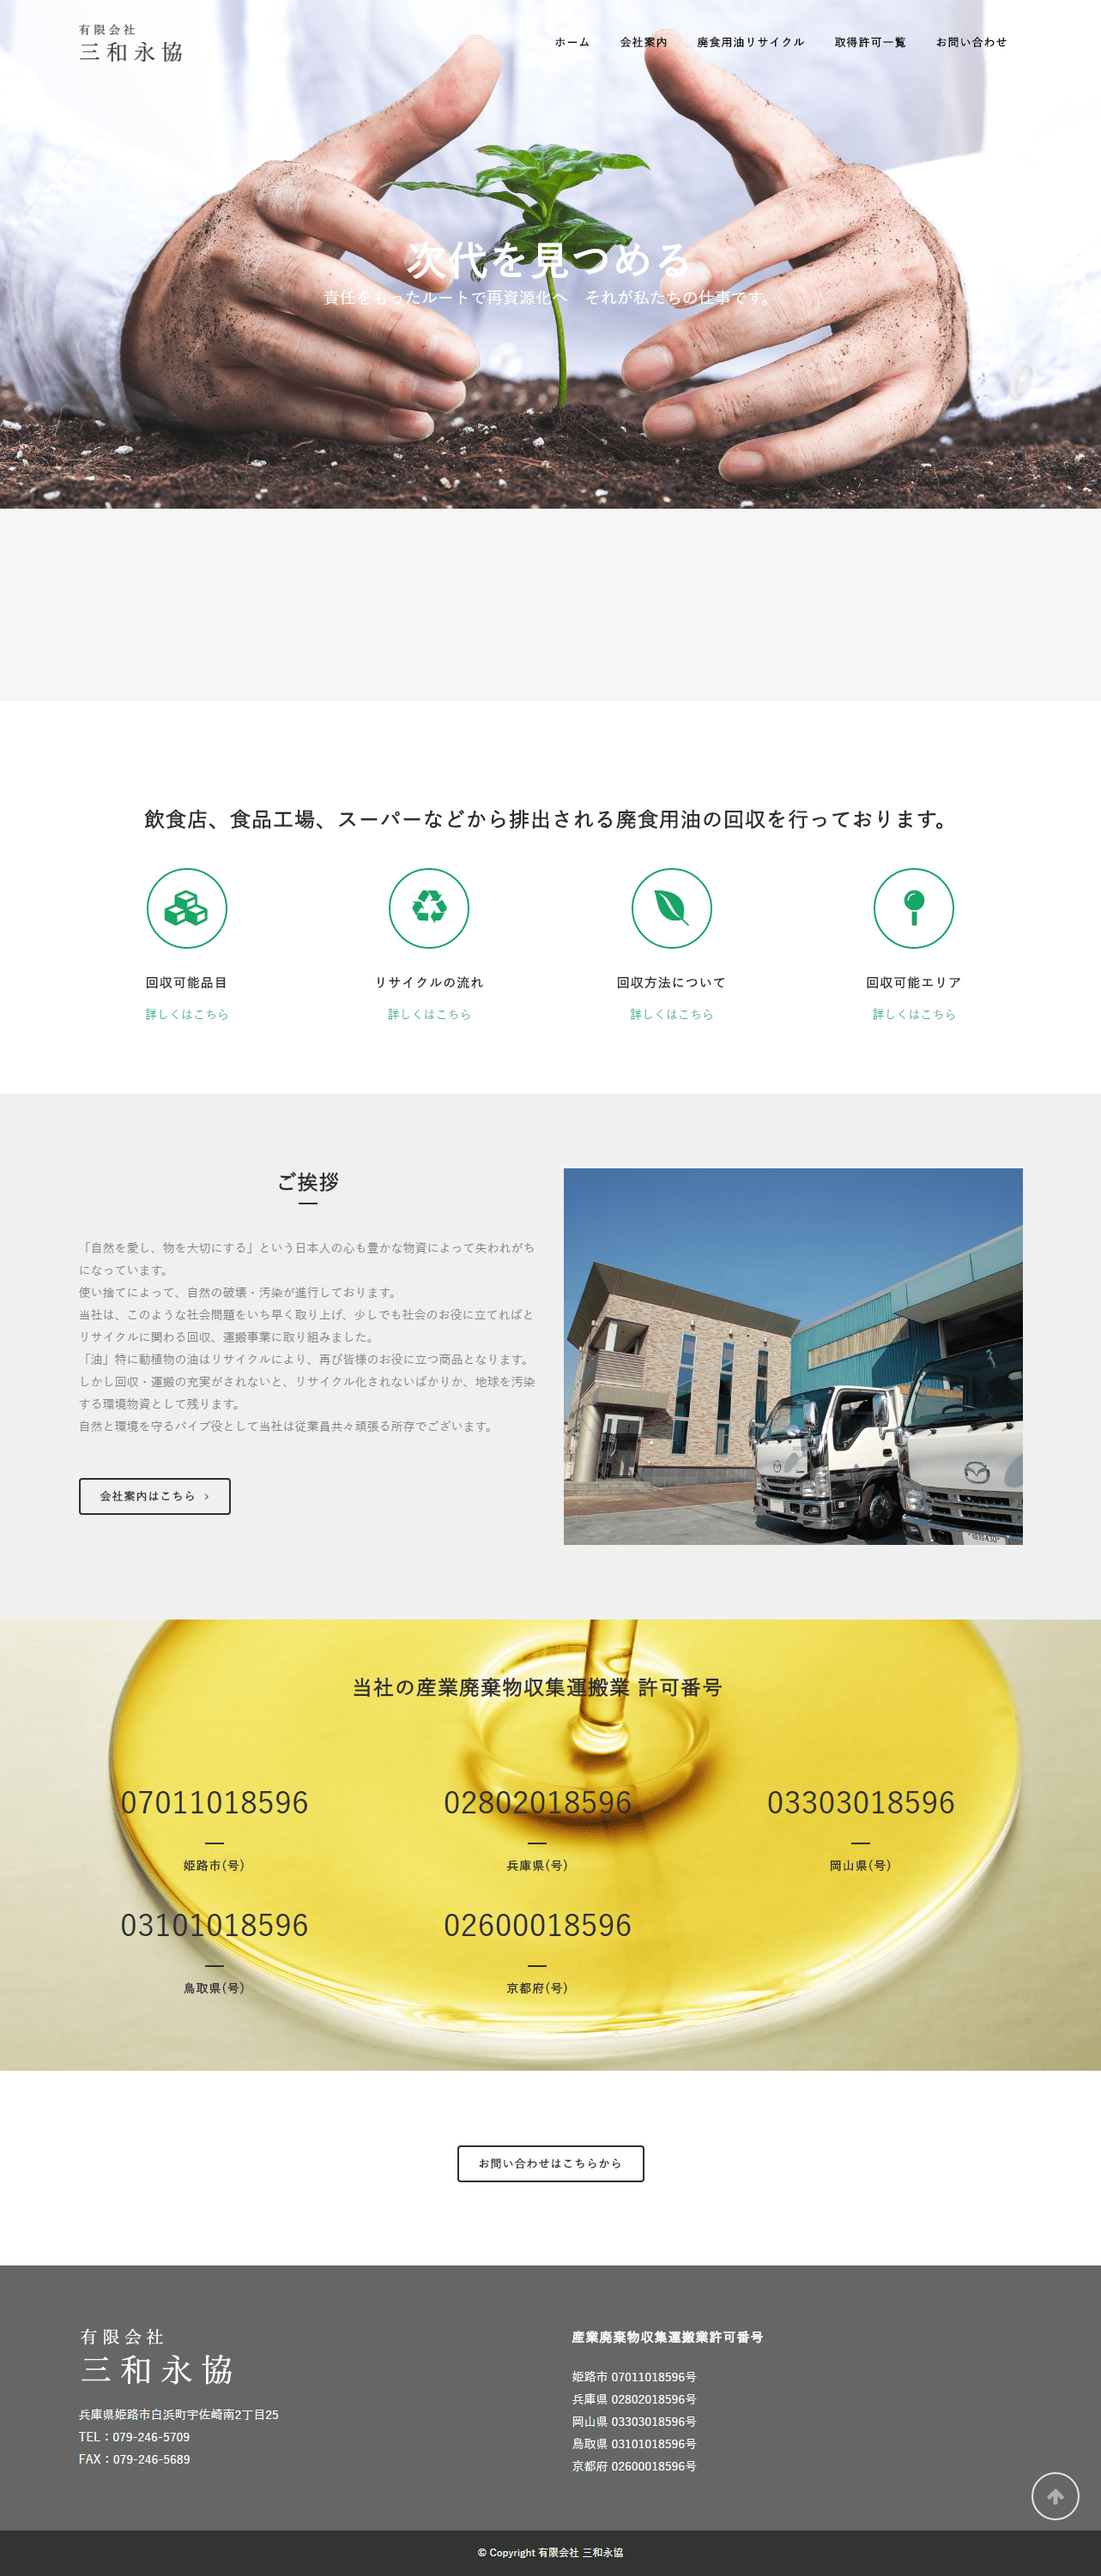 姫路市 有限会社三和永協様 ホームページ制作1